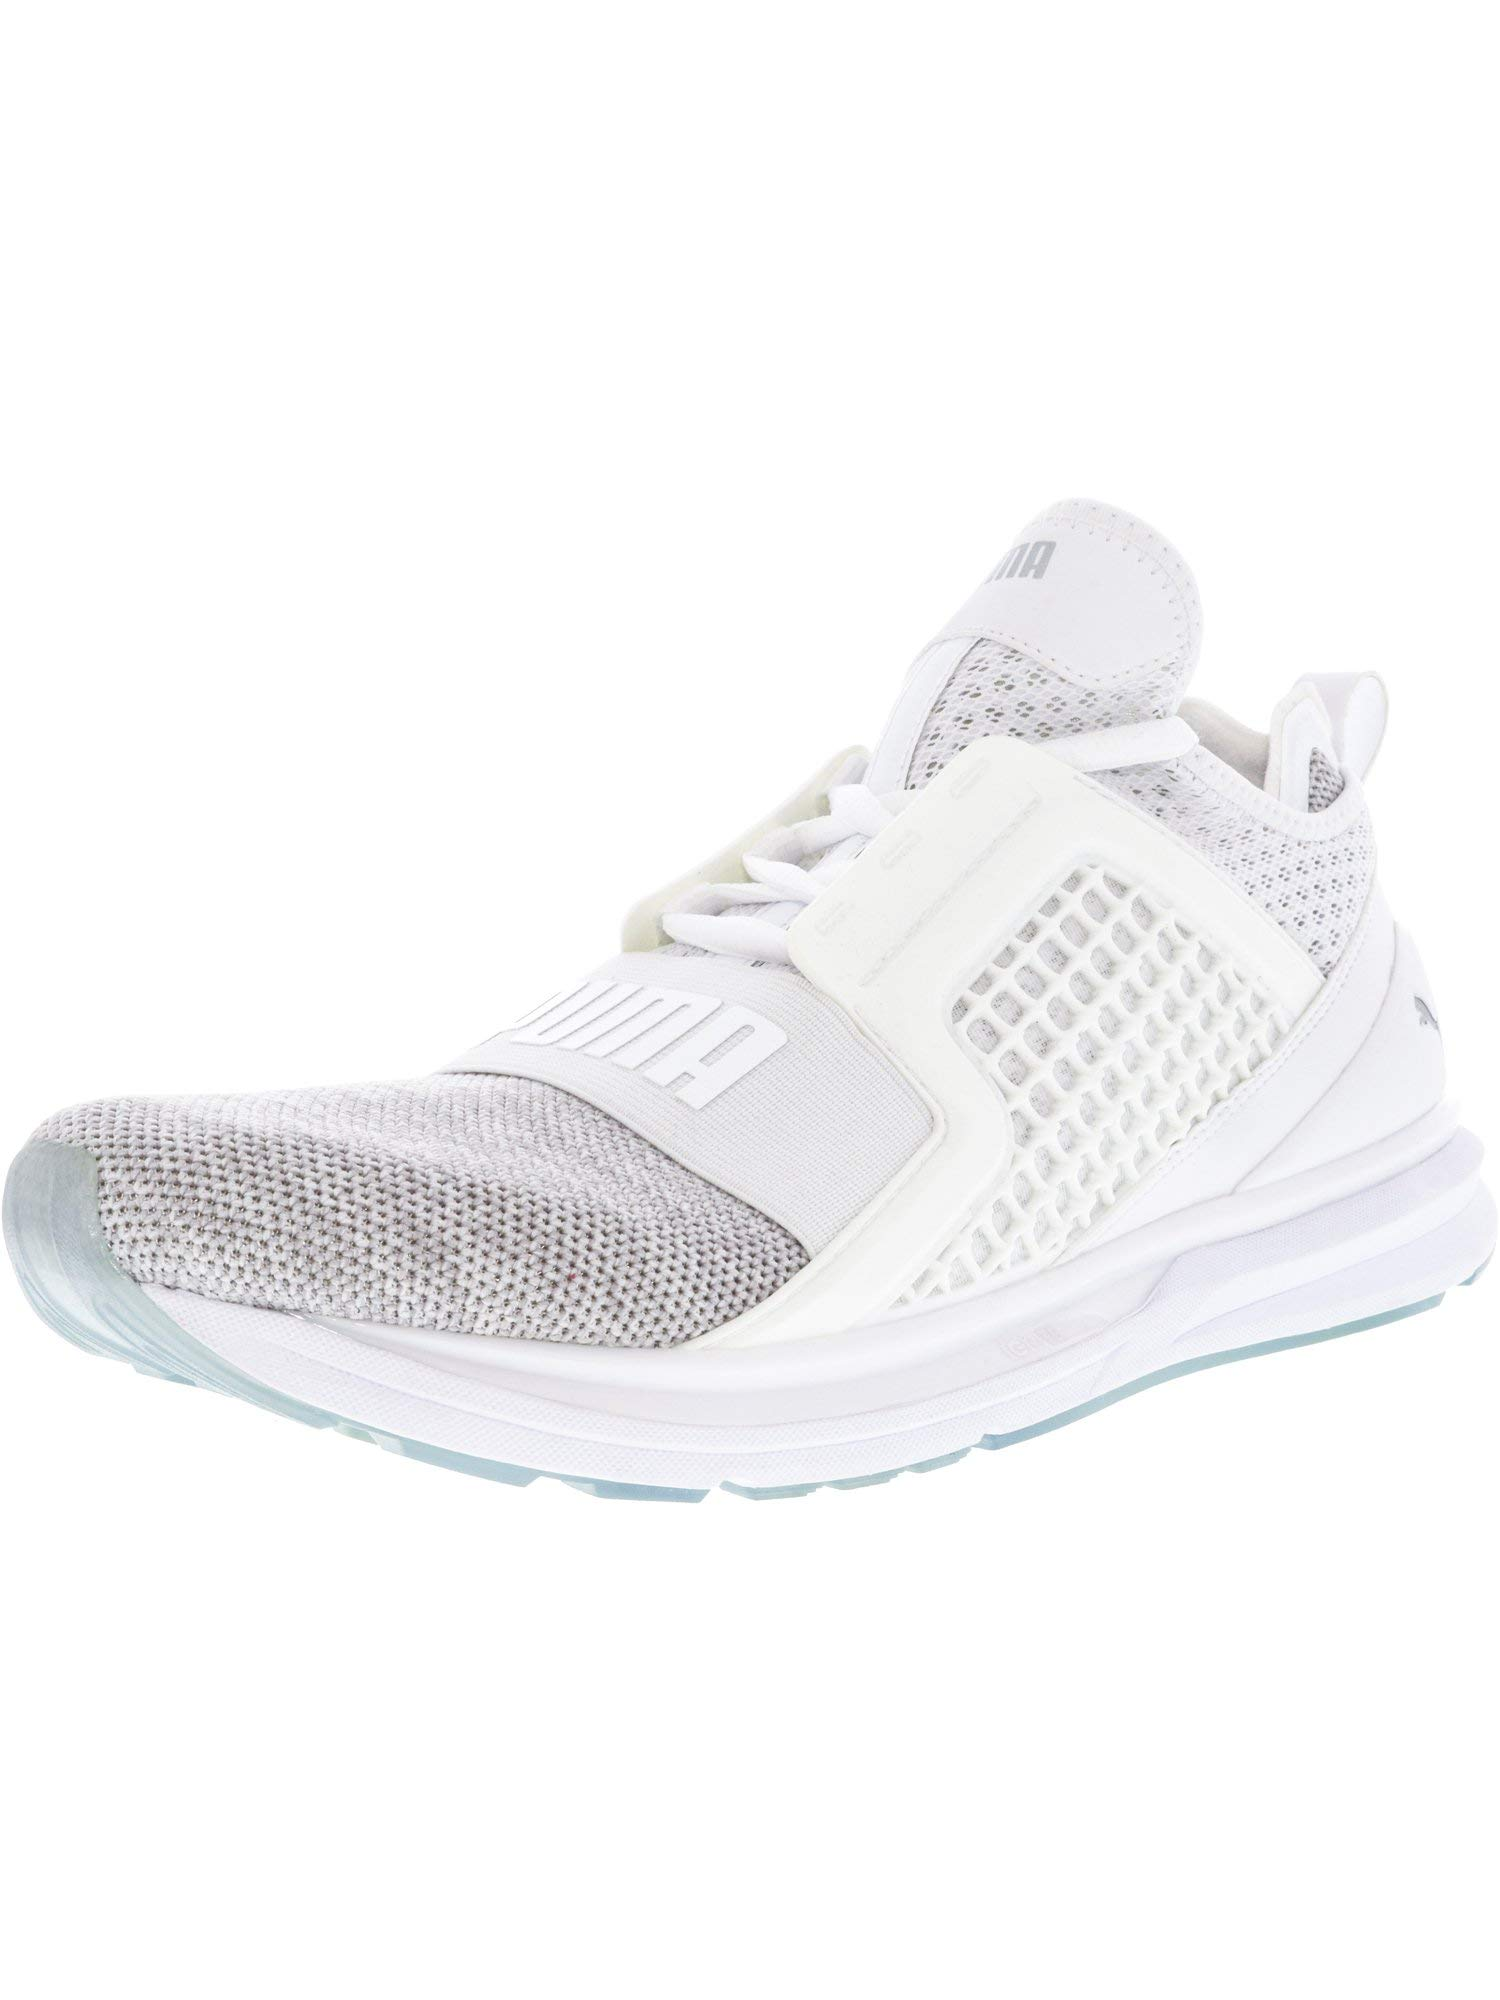 buy popular b8fe0 17842 PUMA Men's Ignite Limitless Knit Sneaker,Puma White/Puma Silver,9 M US